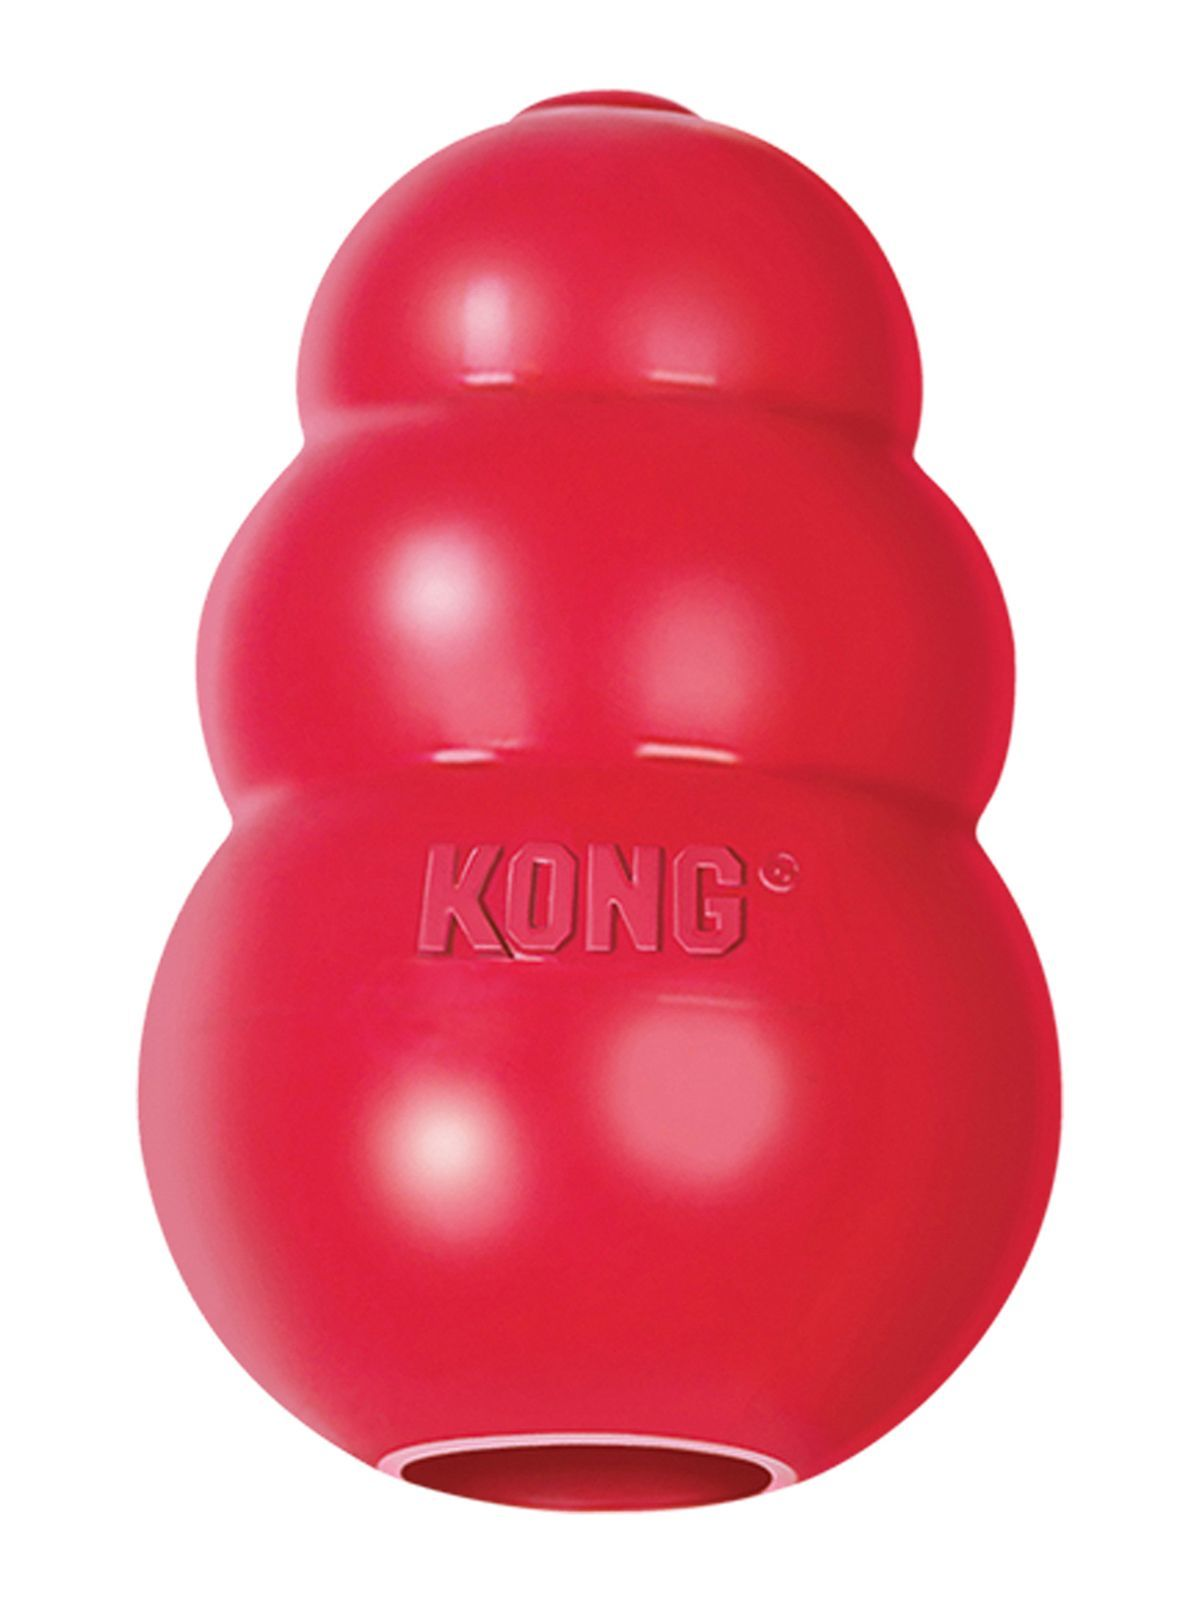 Игрушки Игрушка для собак KONG Classic M средняя 8х6 см T2.jpeg